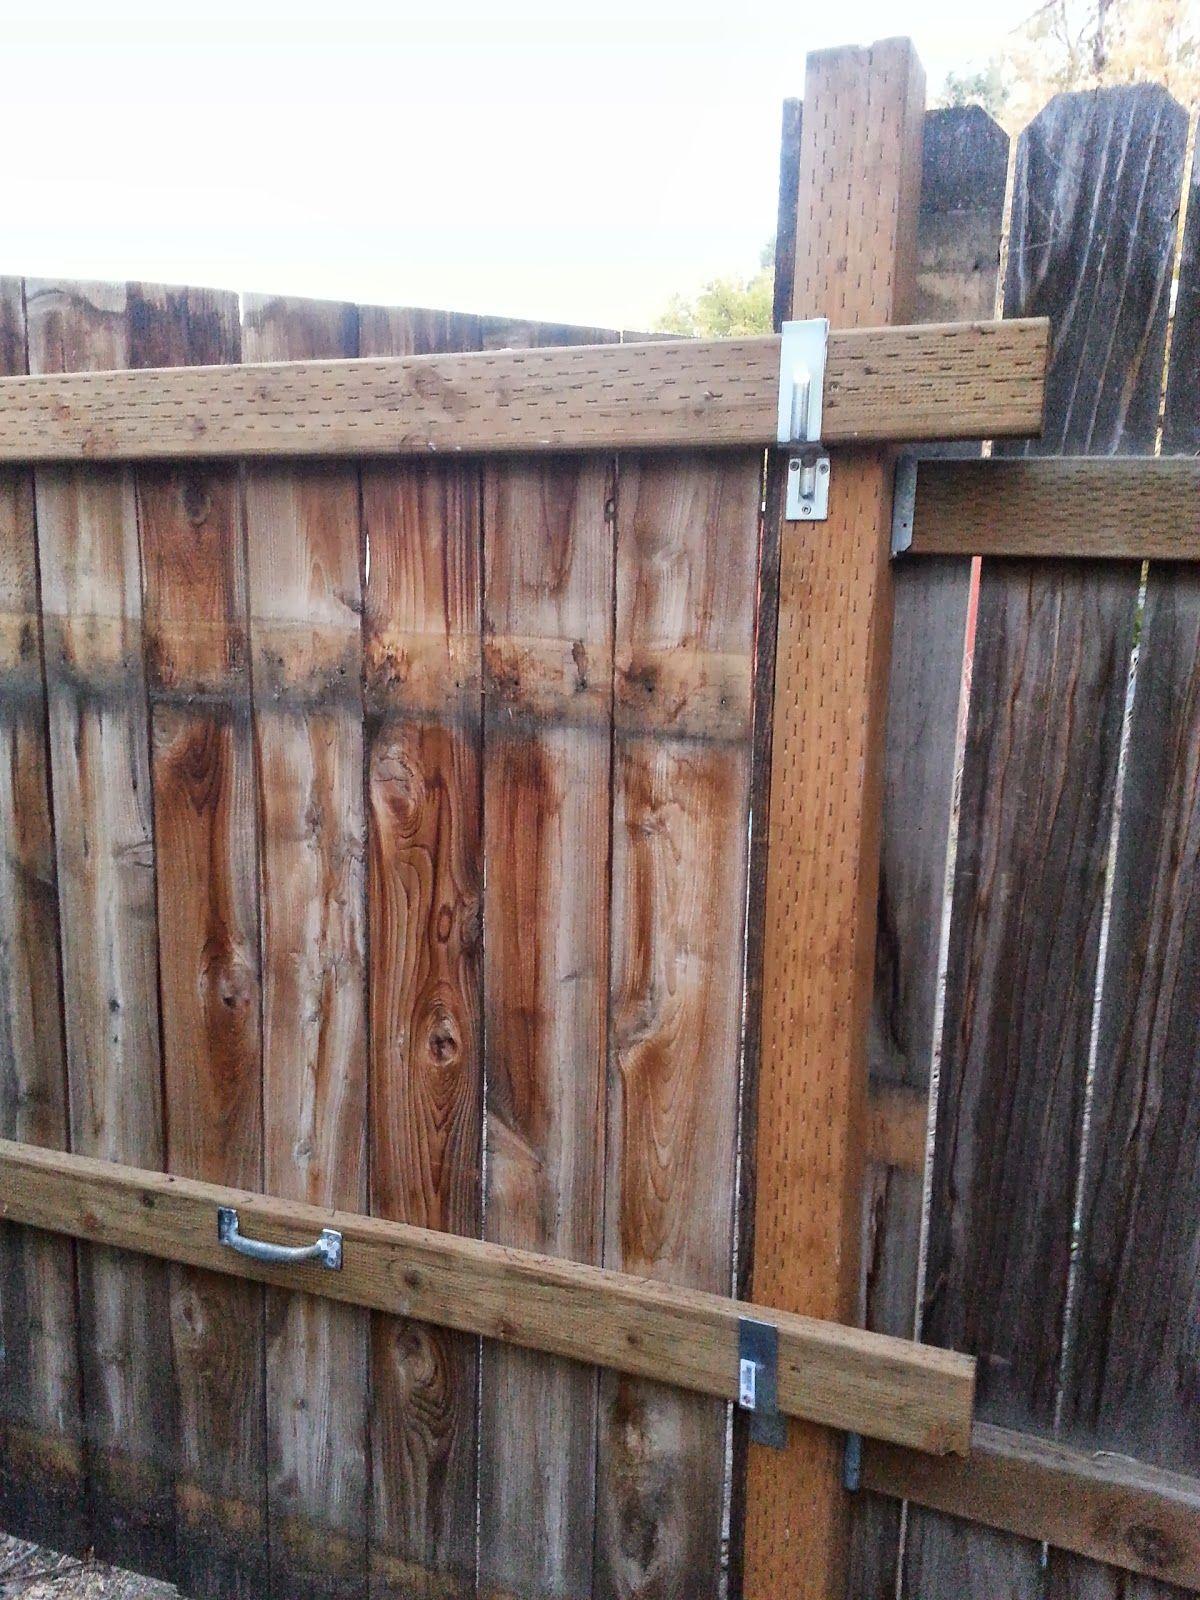 Removable Fence Panel Google Search Fence Panels Fence Design Backyard Fences